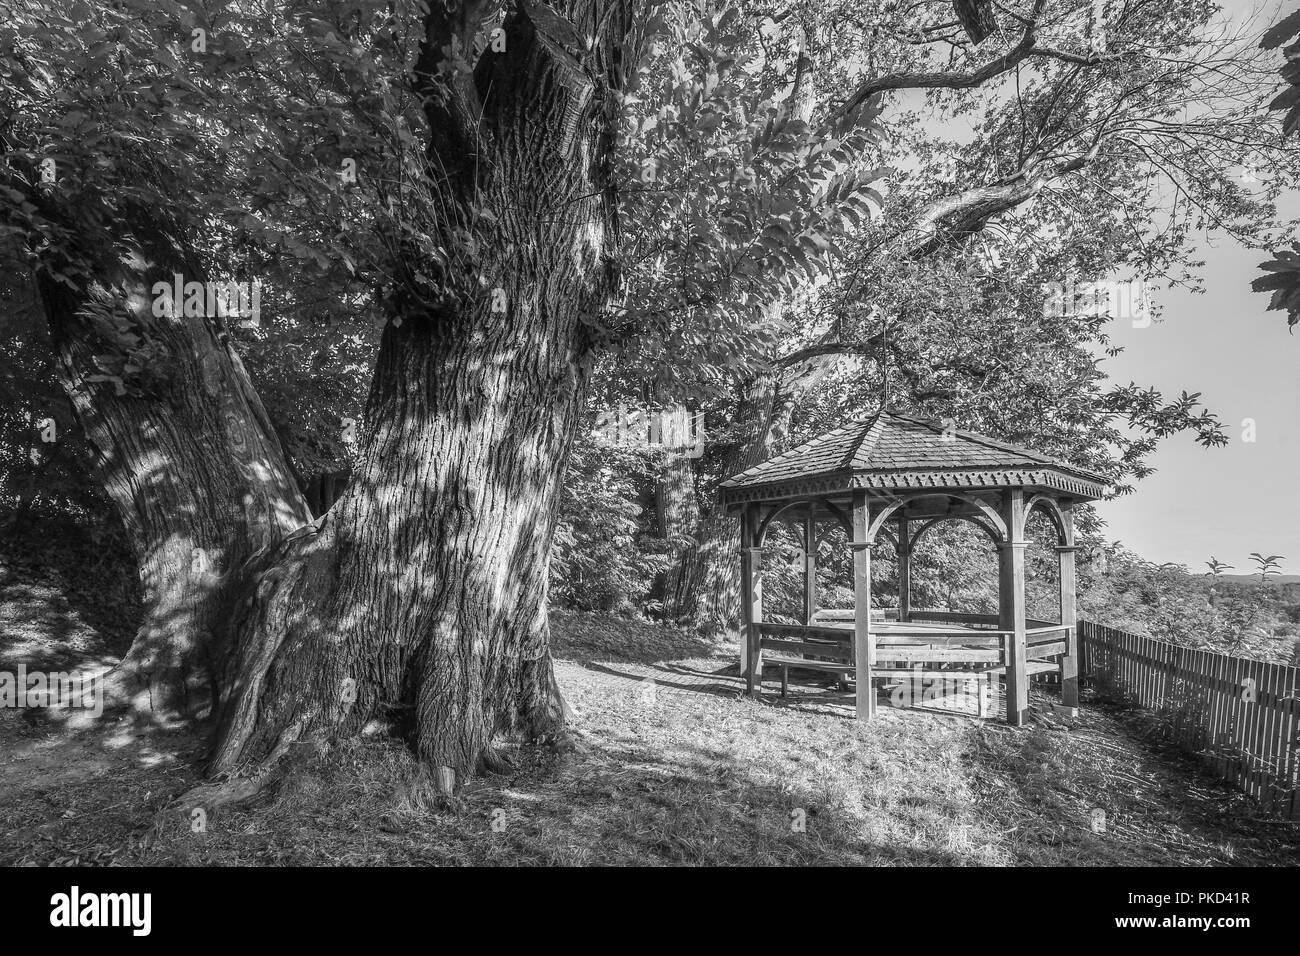 romantic pergola underneath big old tree - Stock Image